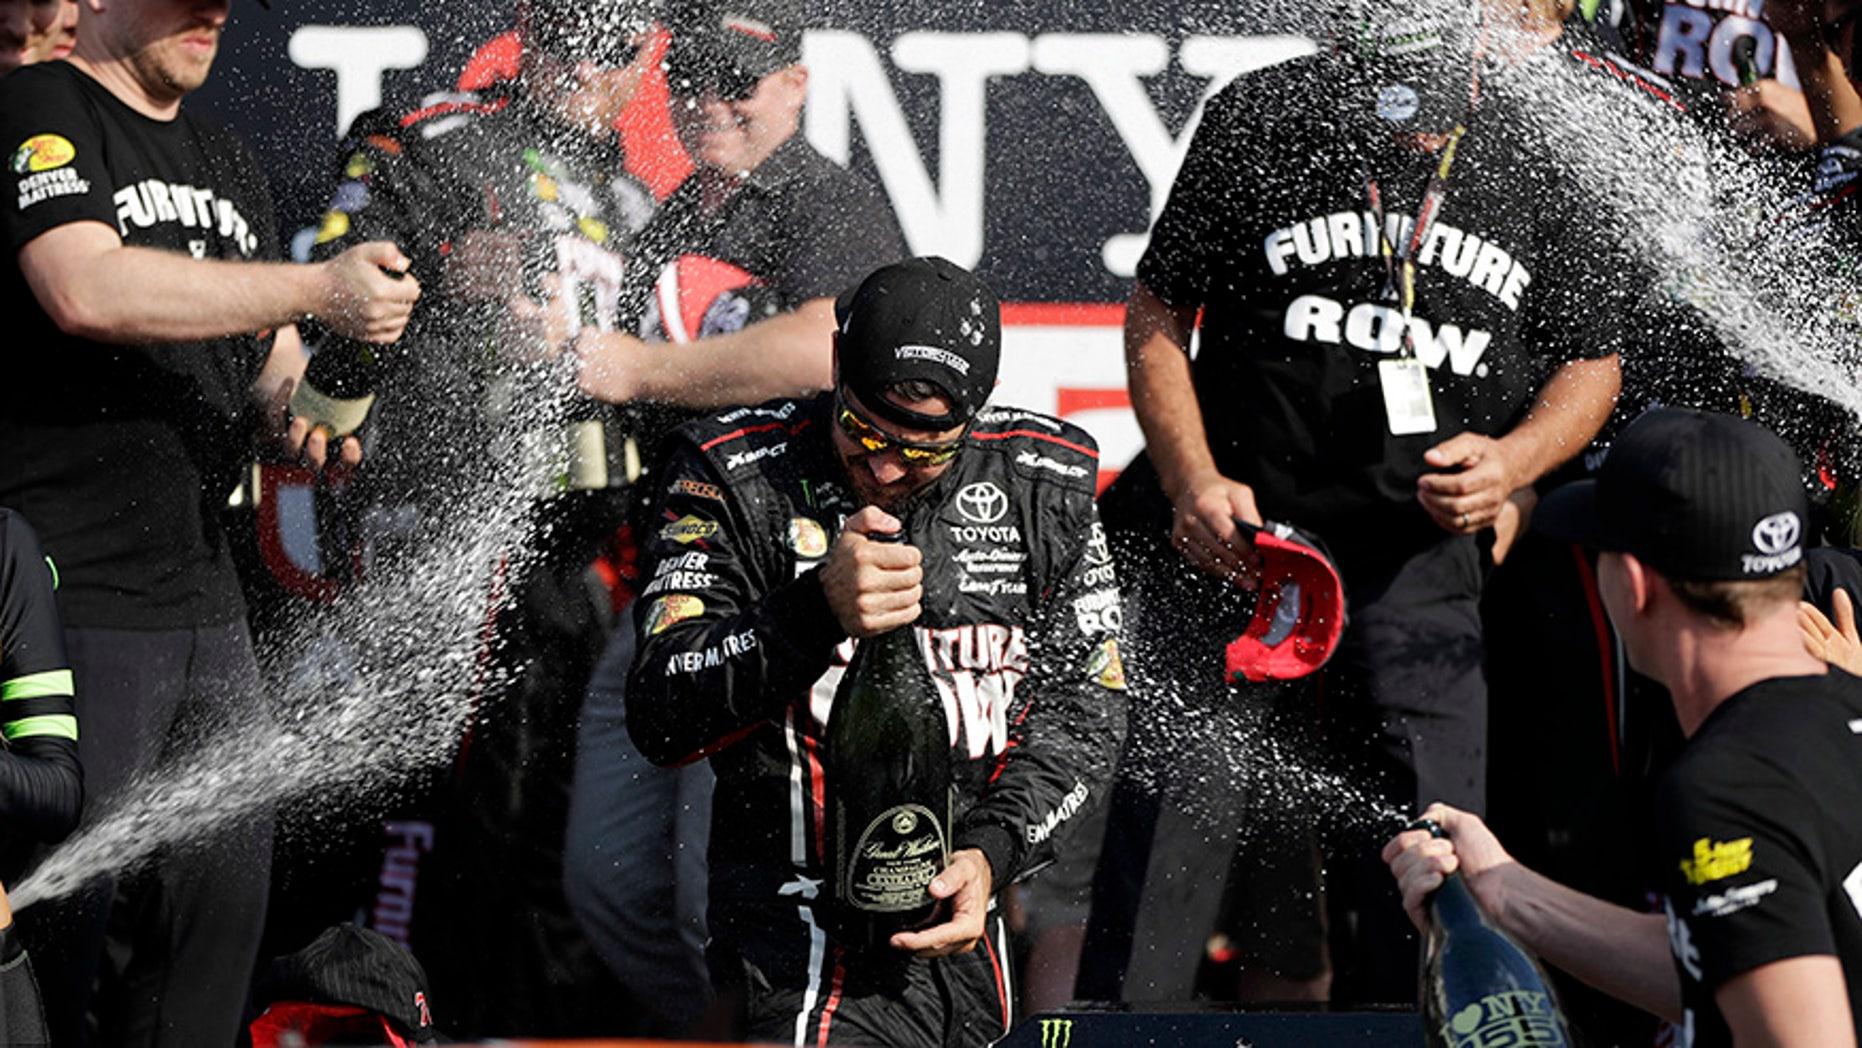 Martin Truex Jr., center, celebrates after winning the NASCAR Cup Series auto race, Sunday, Aug. 6, 2017, in Watkins Glen, N.Y. (AP Photo/Matt Slocum)